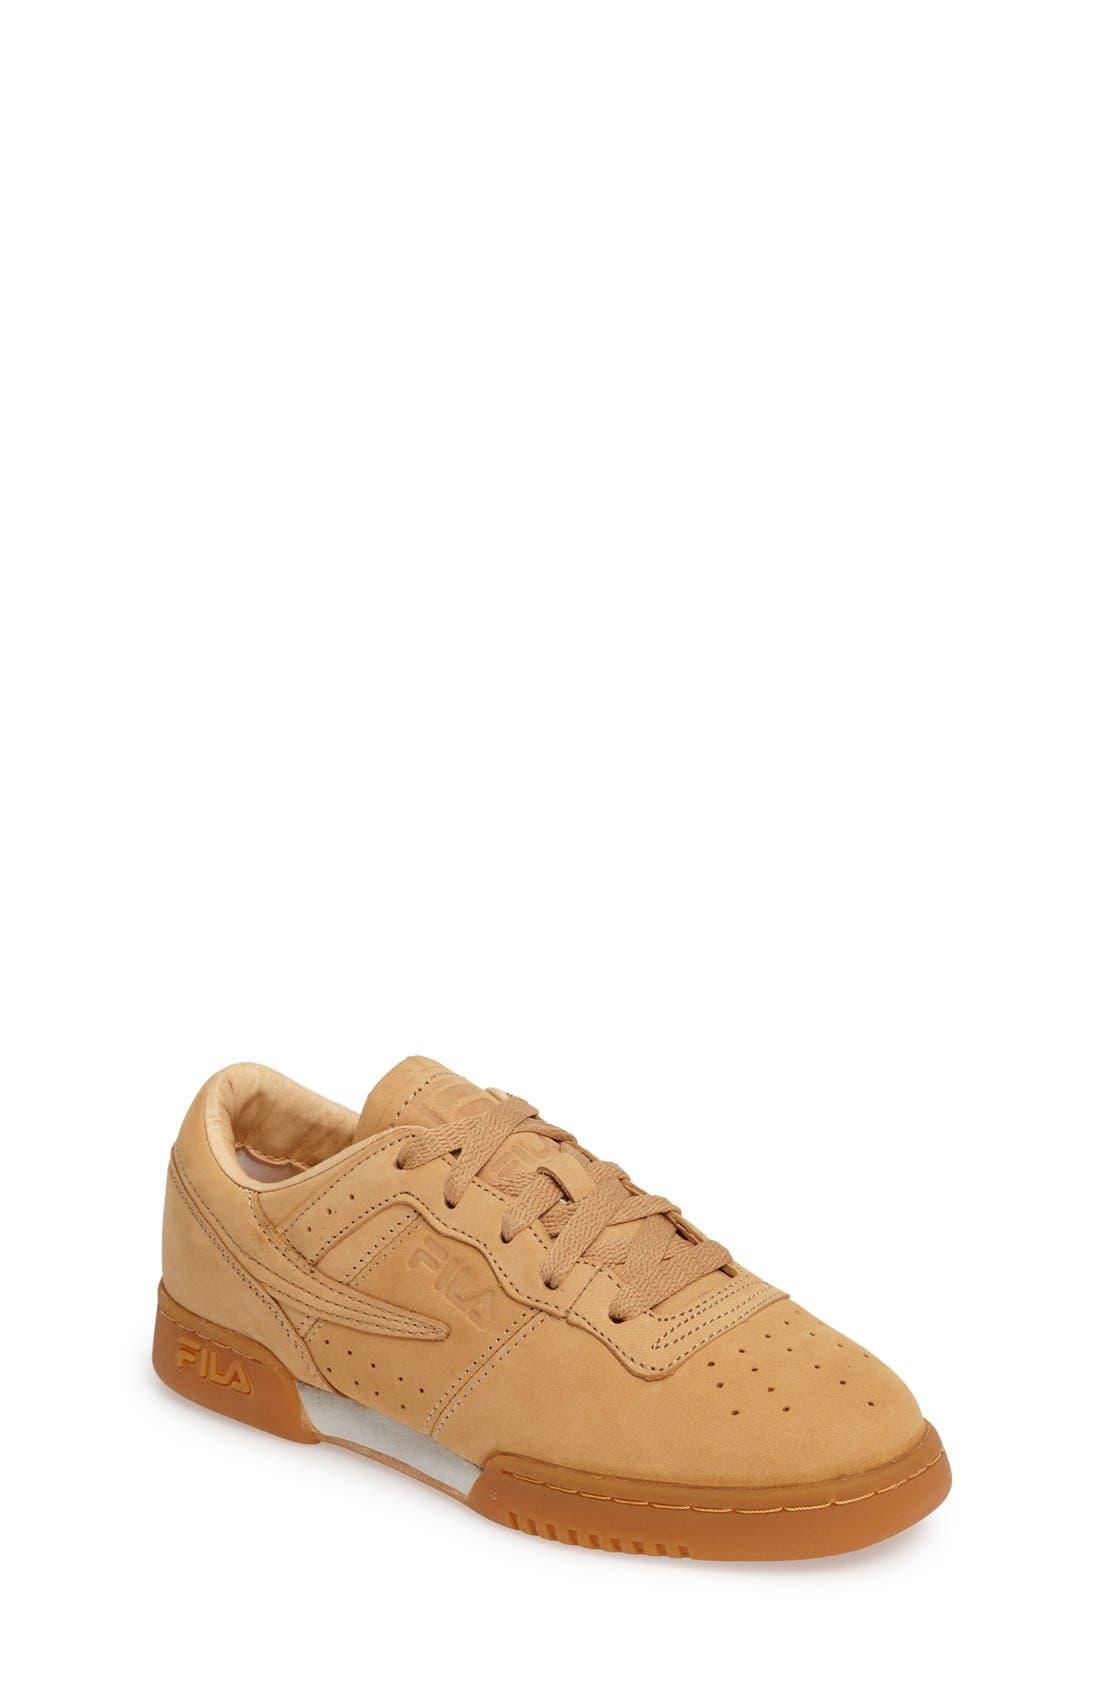 USA Heritage Sneaker,                             Main thumbnail 1, color,                             Tan Nubuck Leather